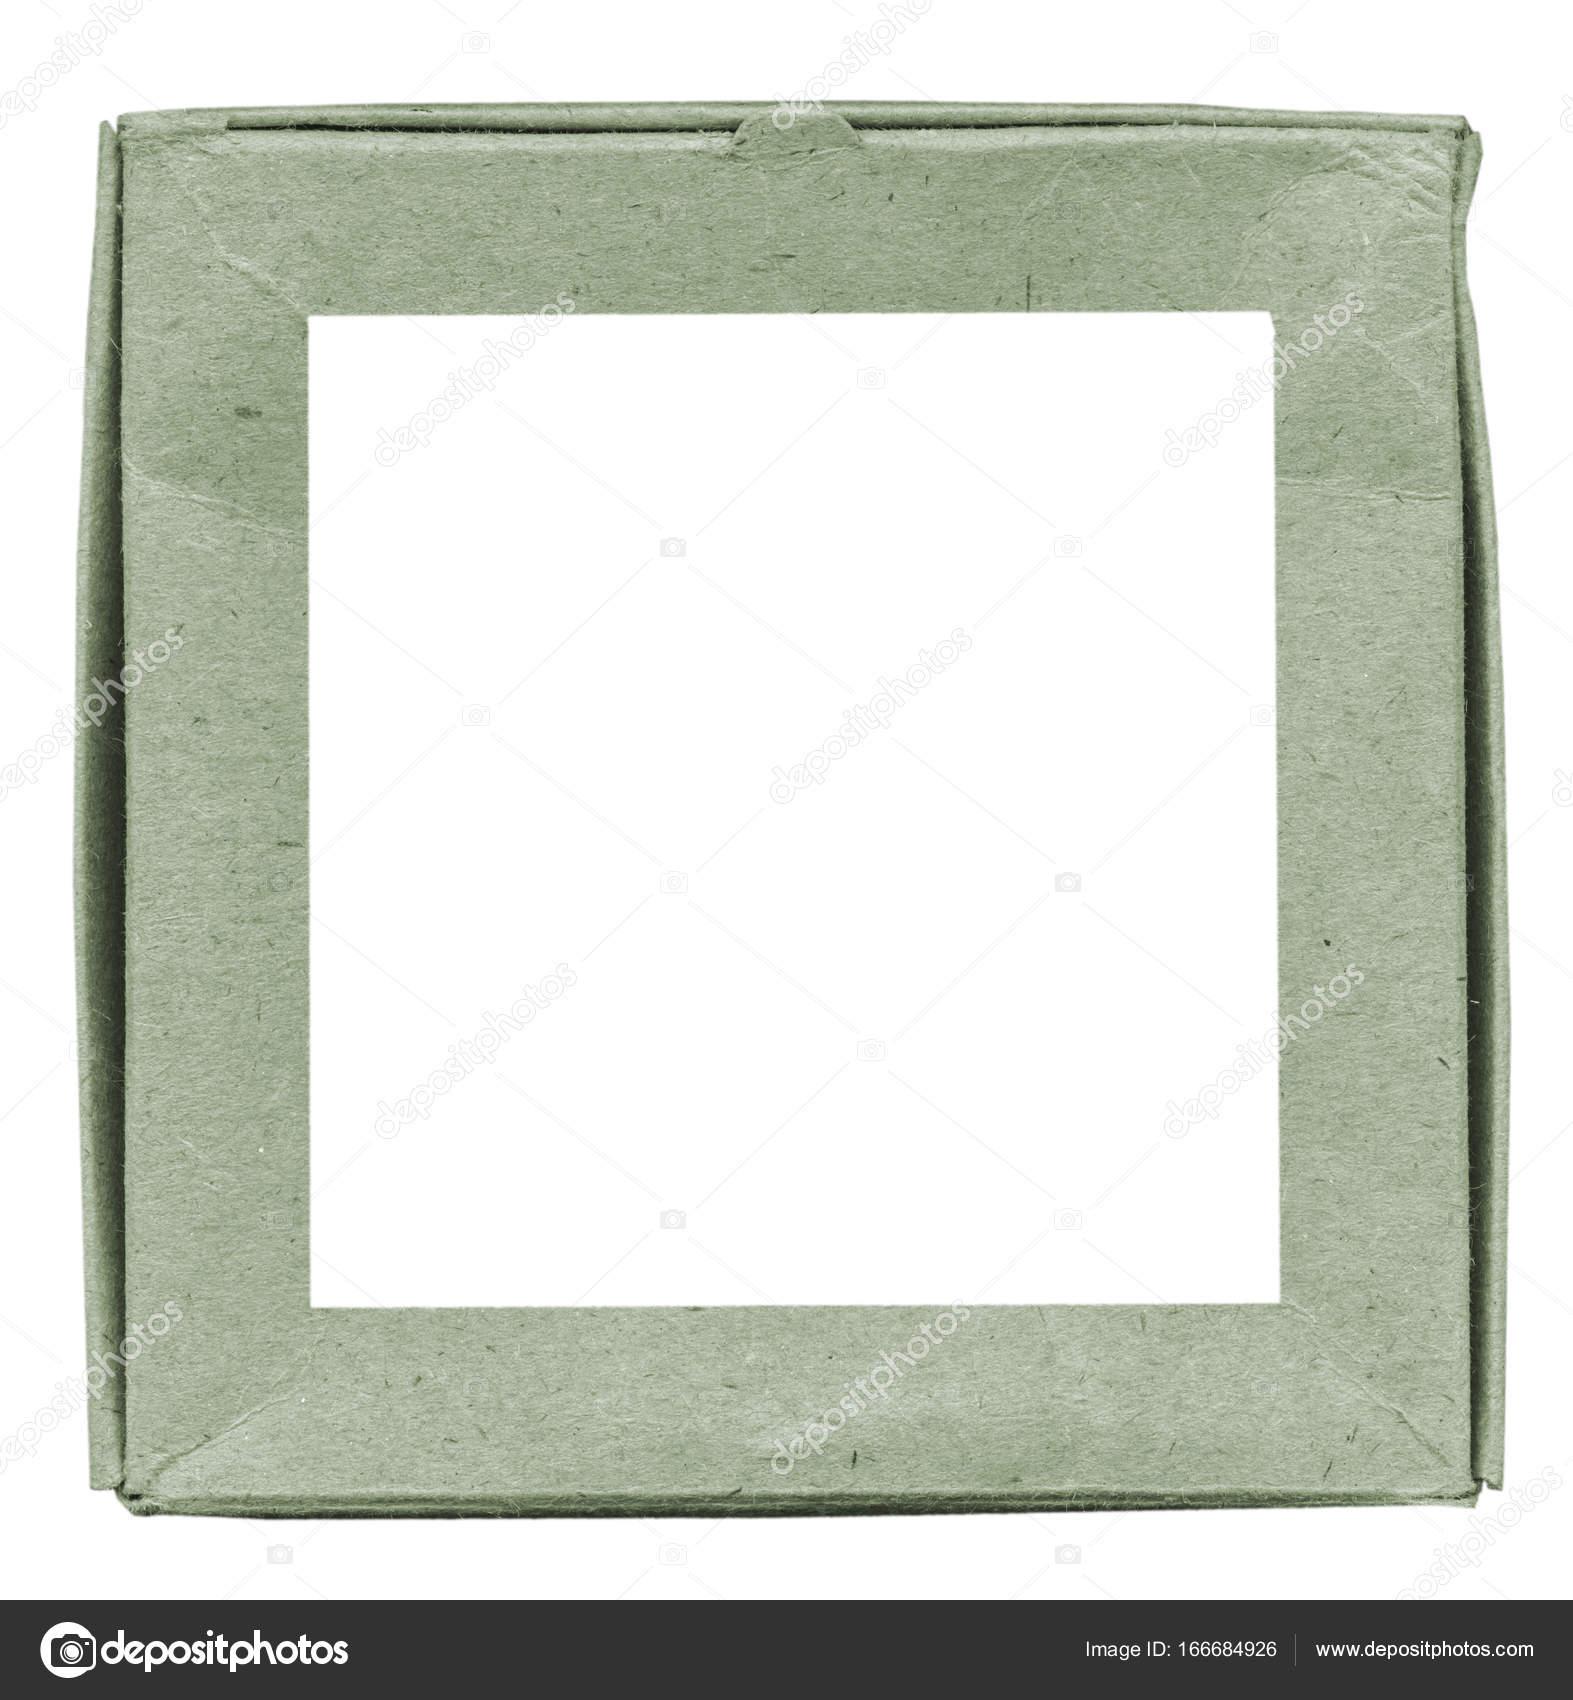 grüne Pappe quadratischen Rahmen — Stockfoto © natalt #166684926